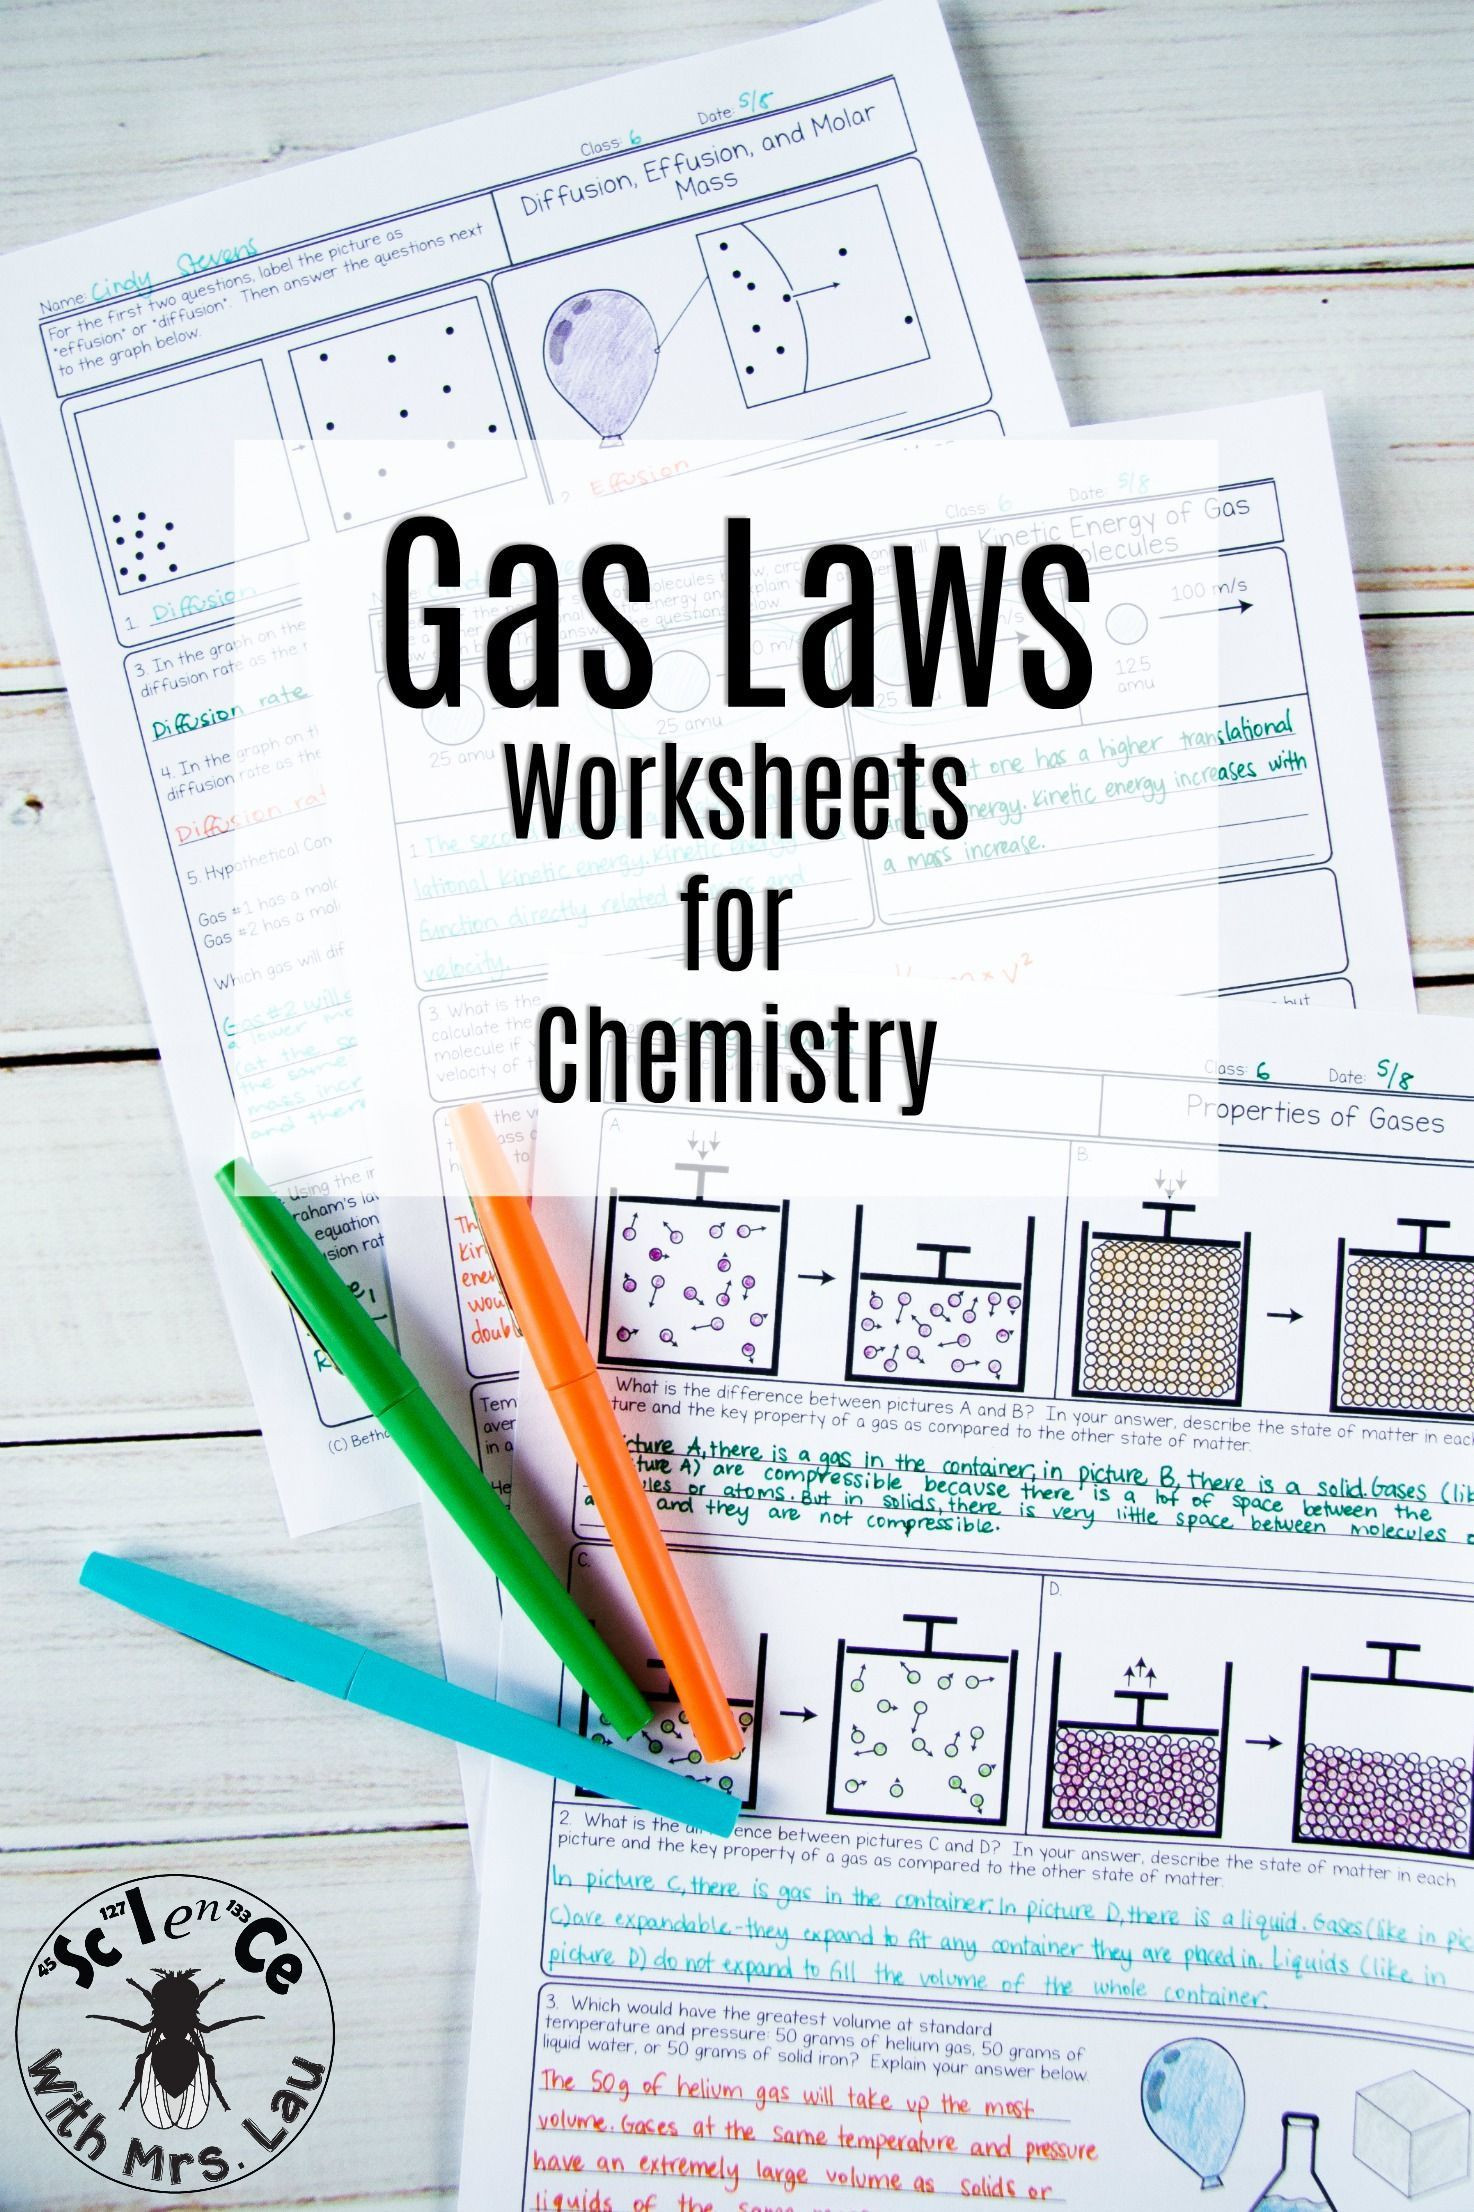 Density Calculations Worksheet Answer Key Linearqualified Science 8 Density Calculations Worksheet